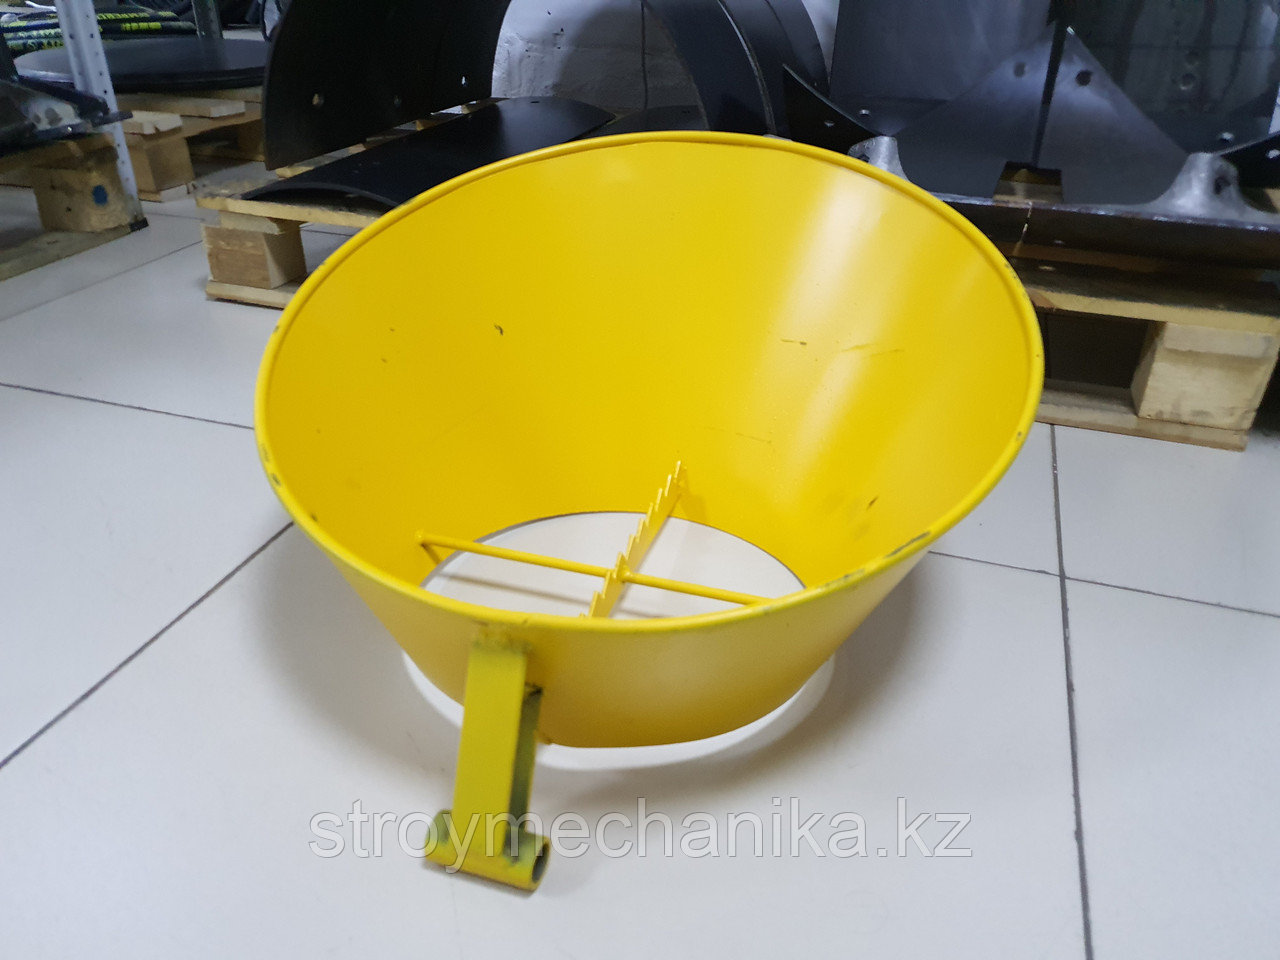 Воронка для пневмонагнетателя СО-241